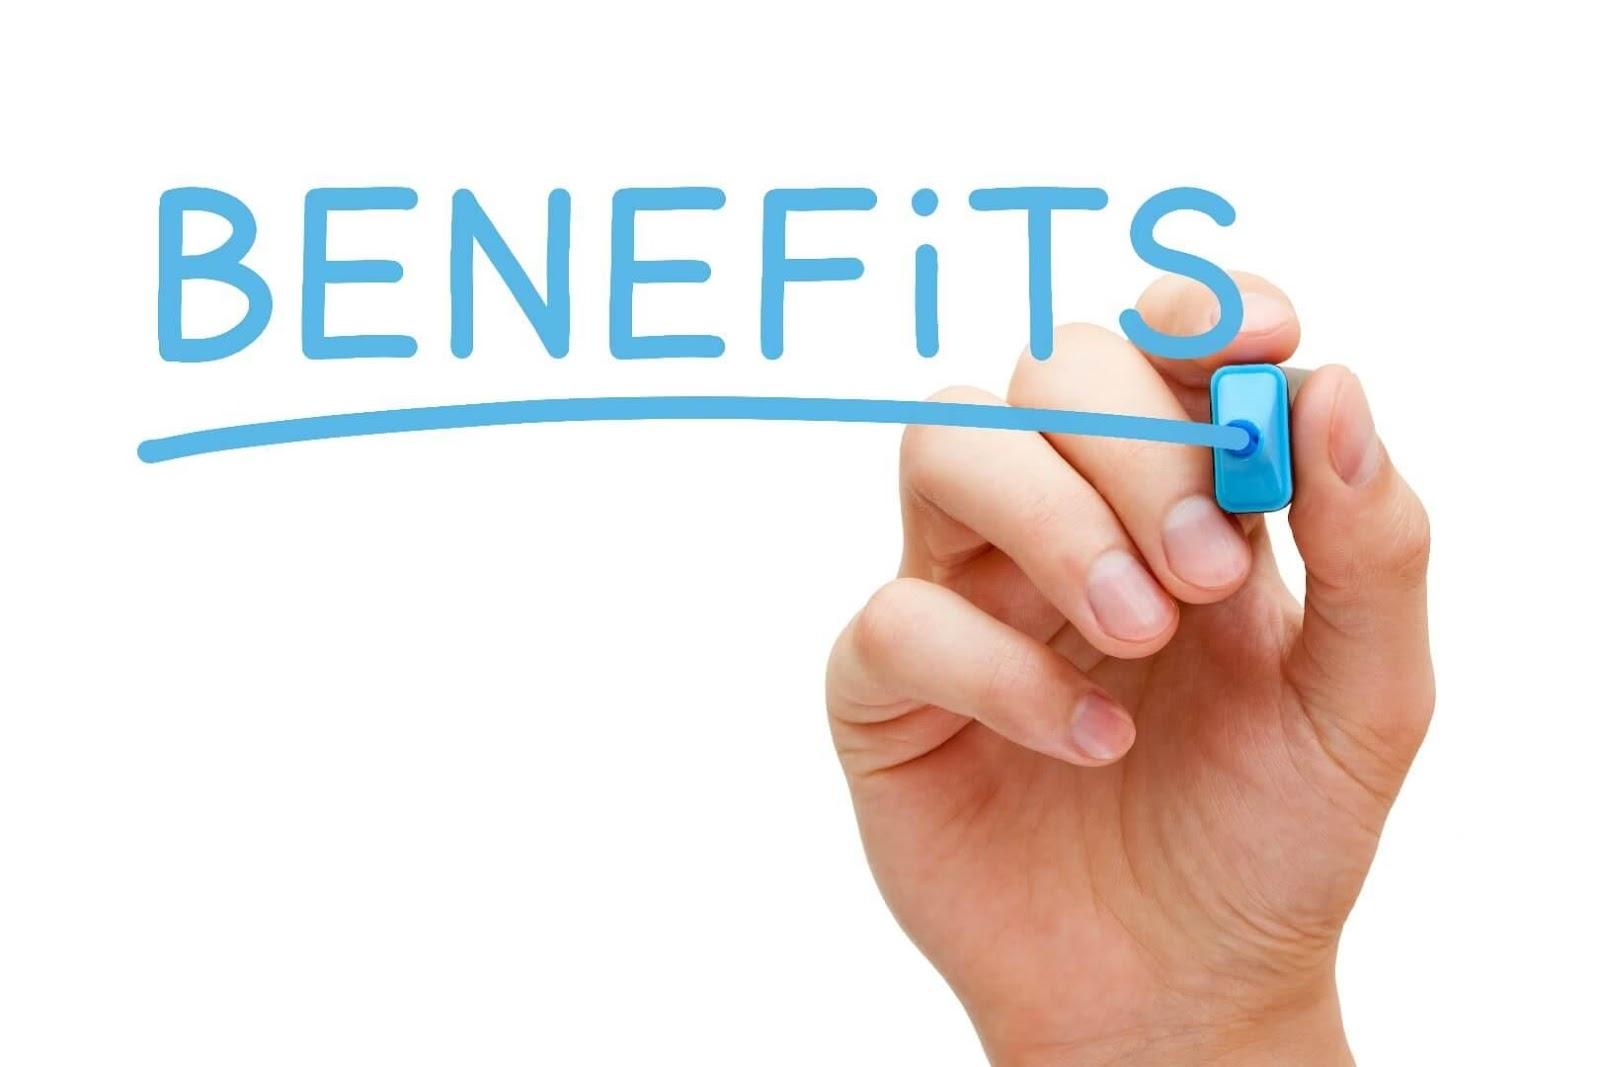 Benefits is written here.